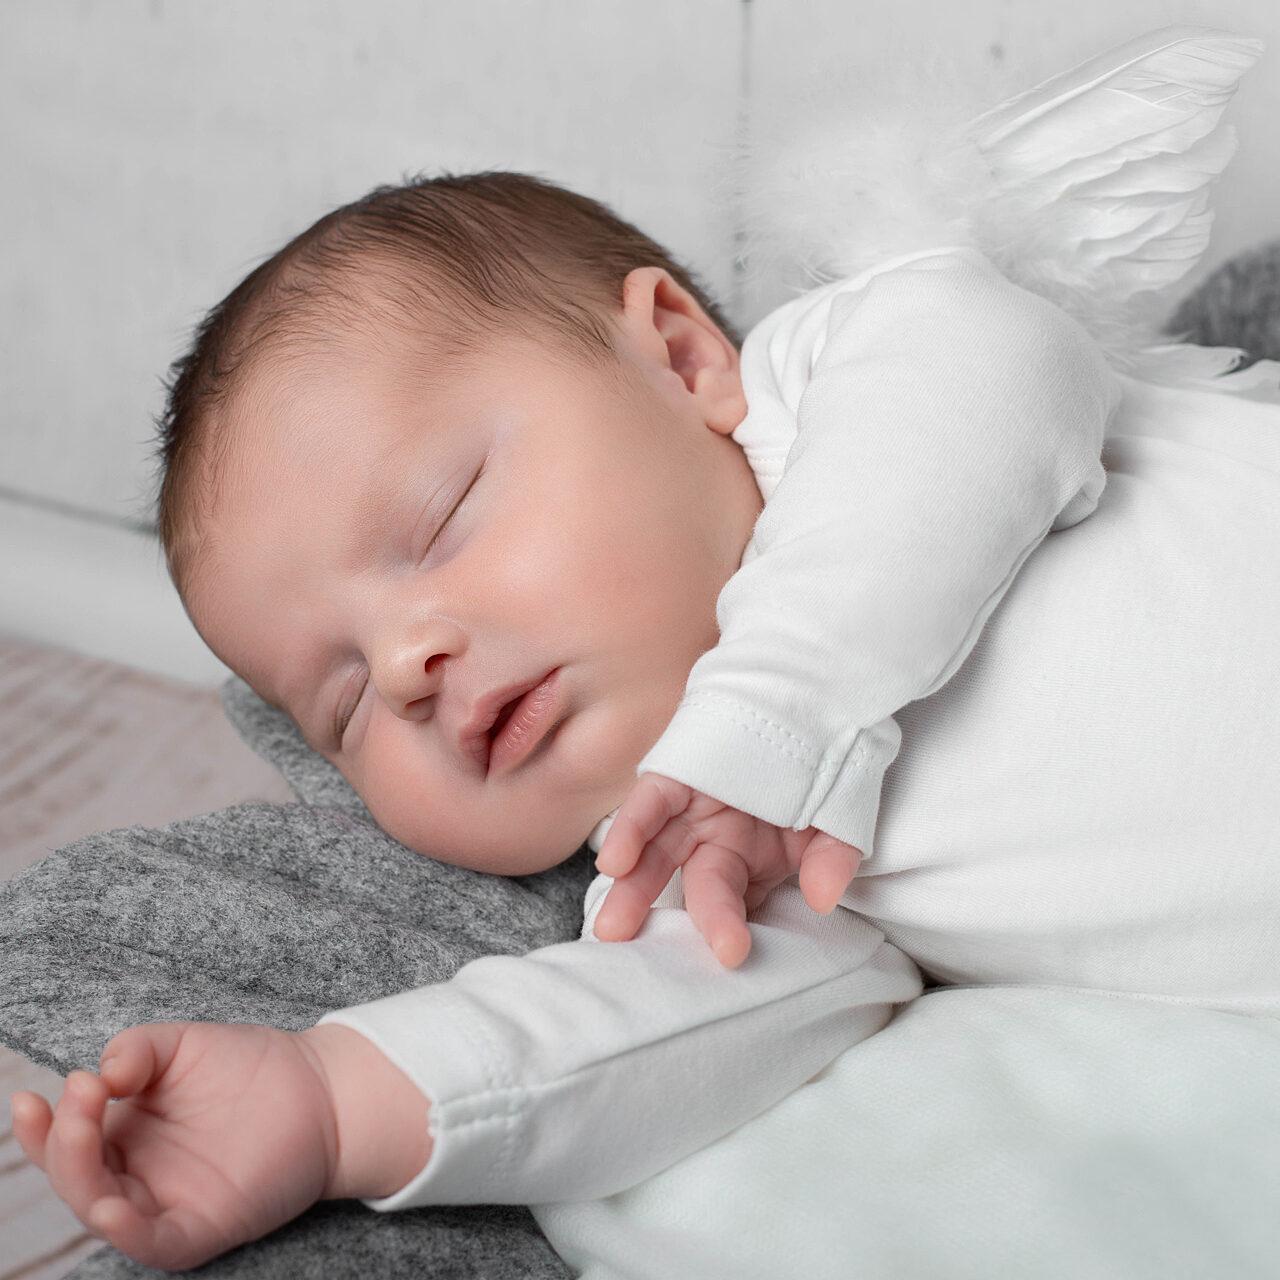 cropped BabyfotografLandkreisDeggendorfRegenPlattlingStraubing - seibildschoen